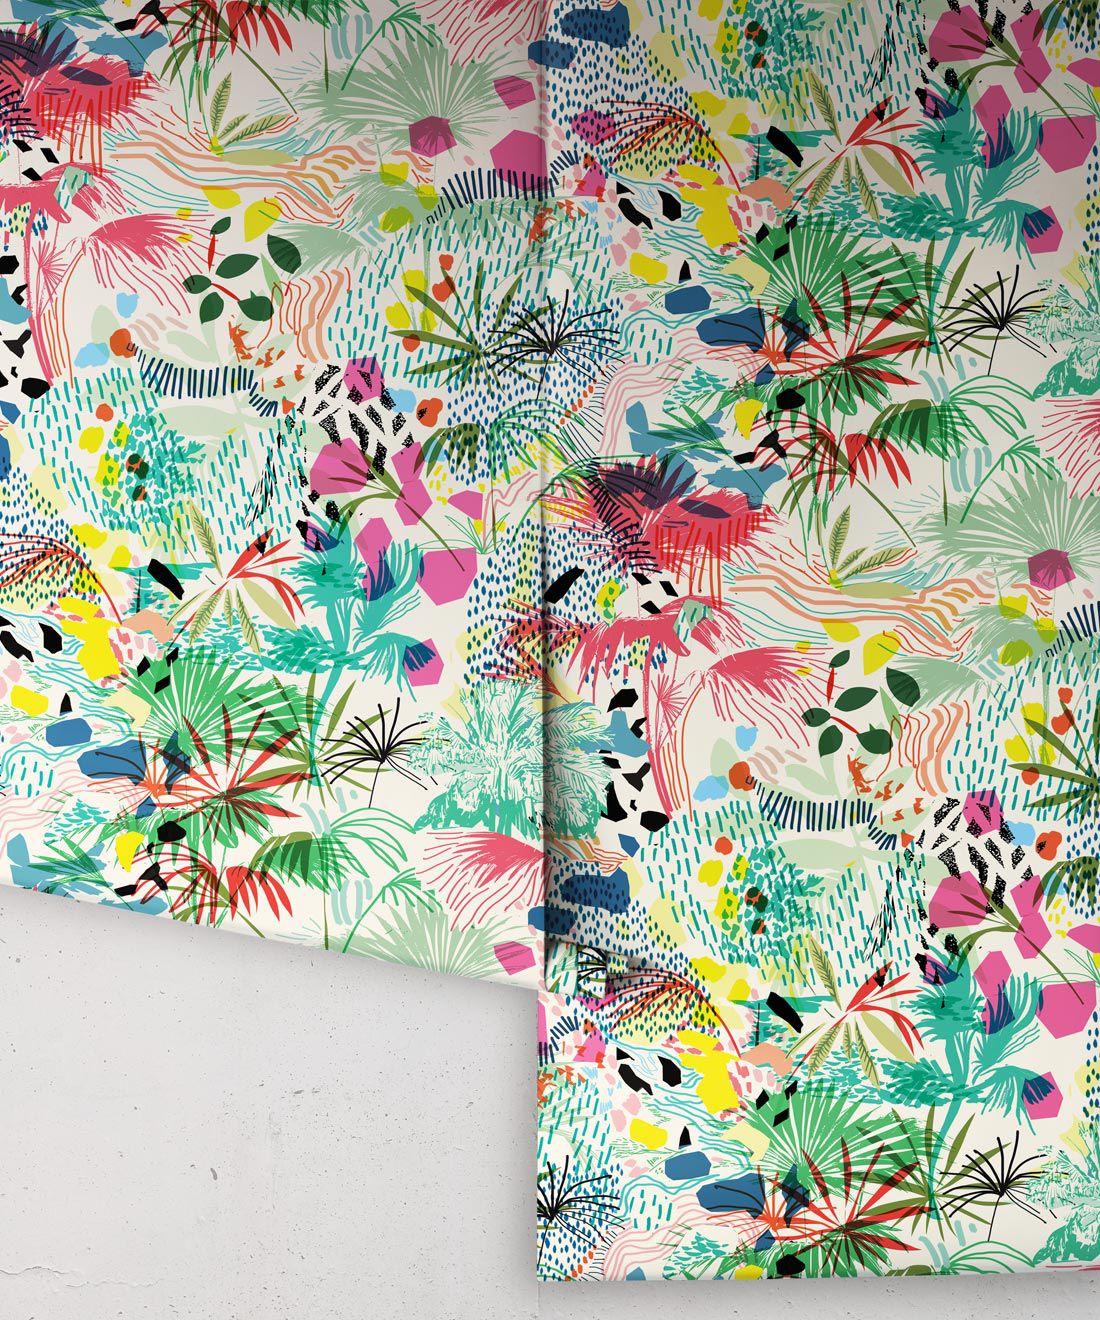 Encinitas Wallpaper • Colourful Floral Wallpaper • Rolls